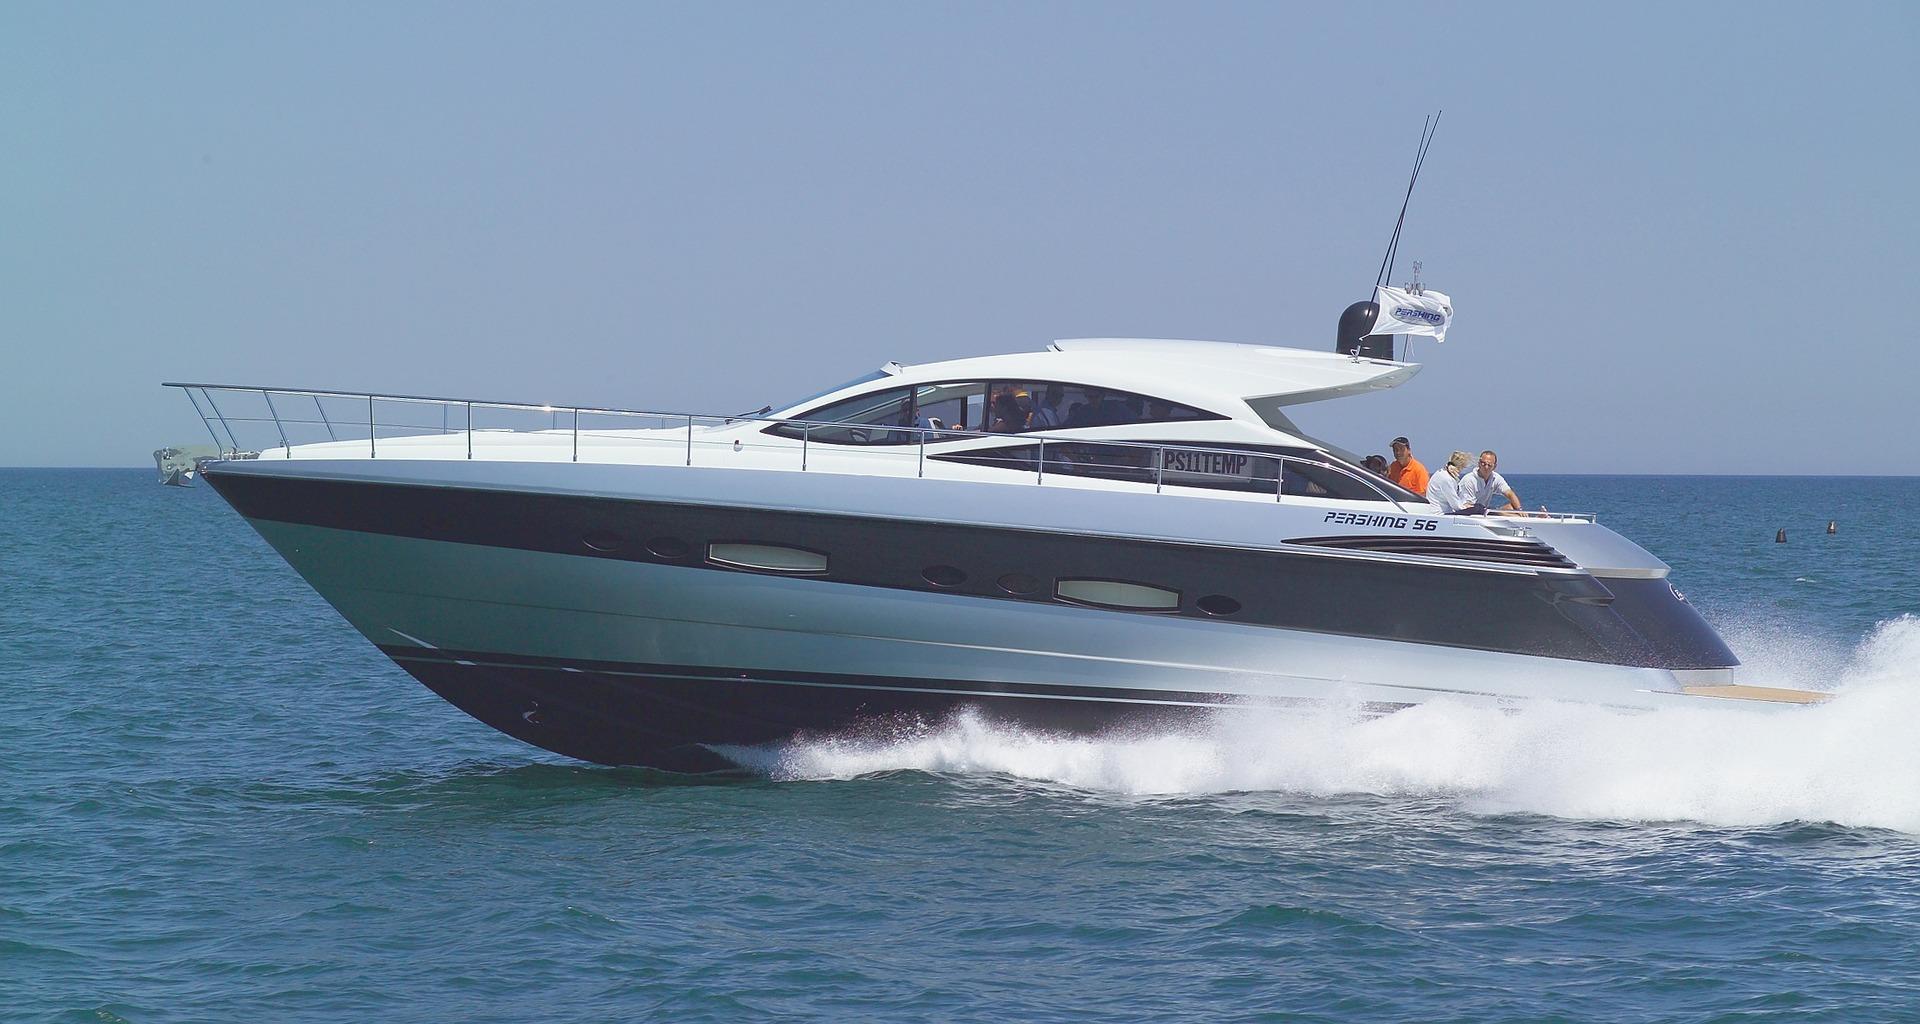 yacht-838708_1920.jpg